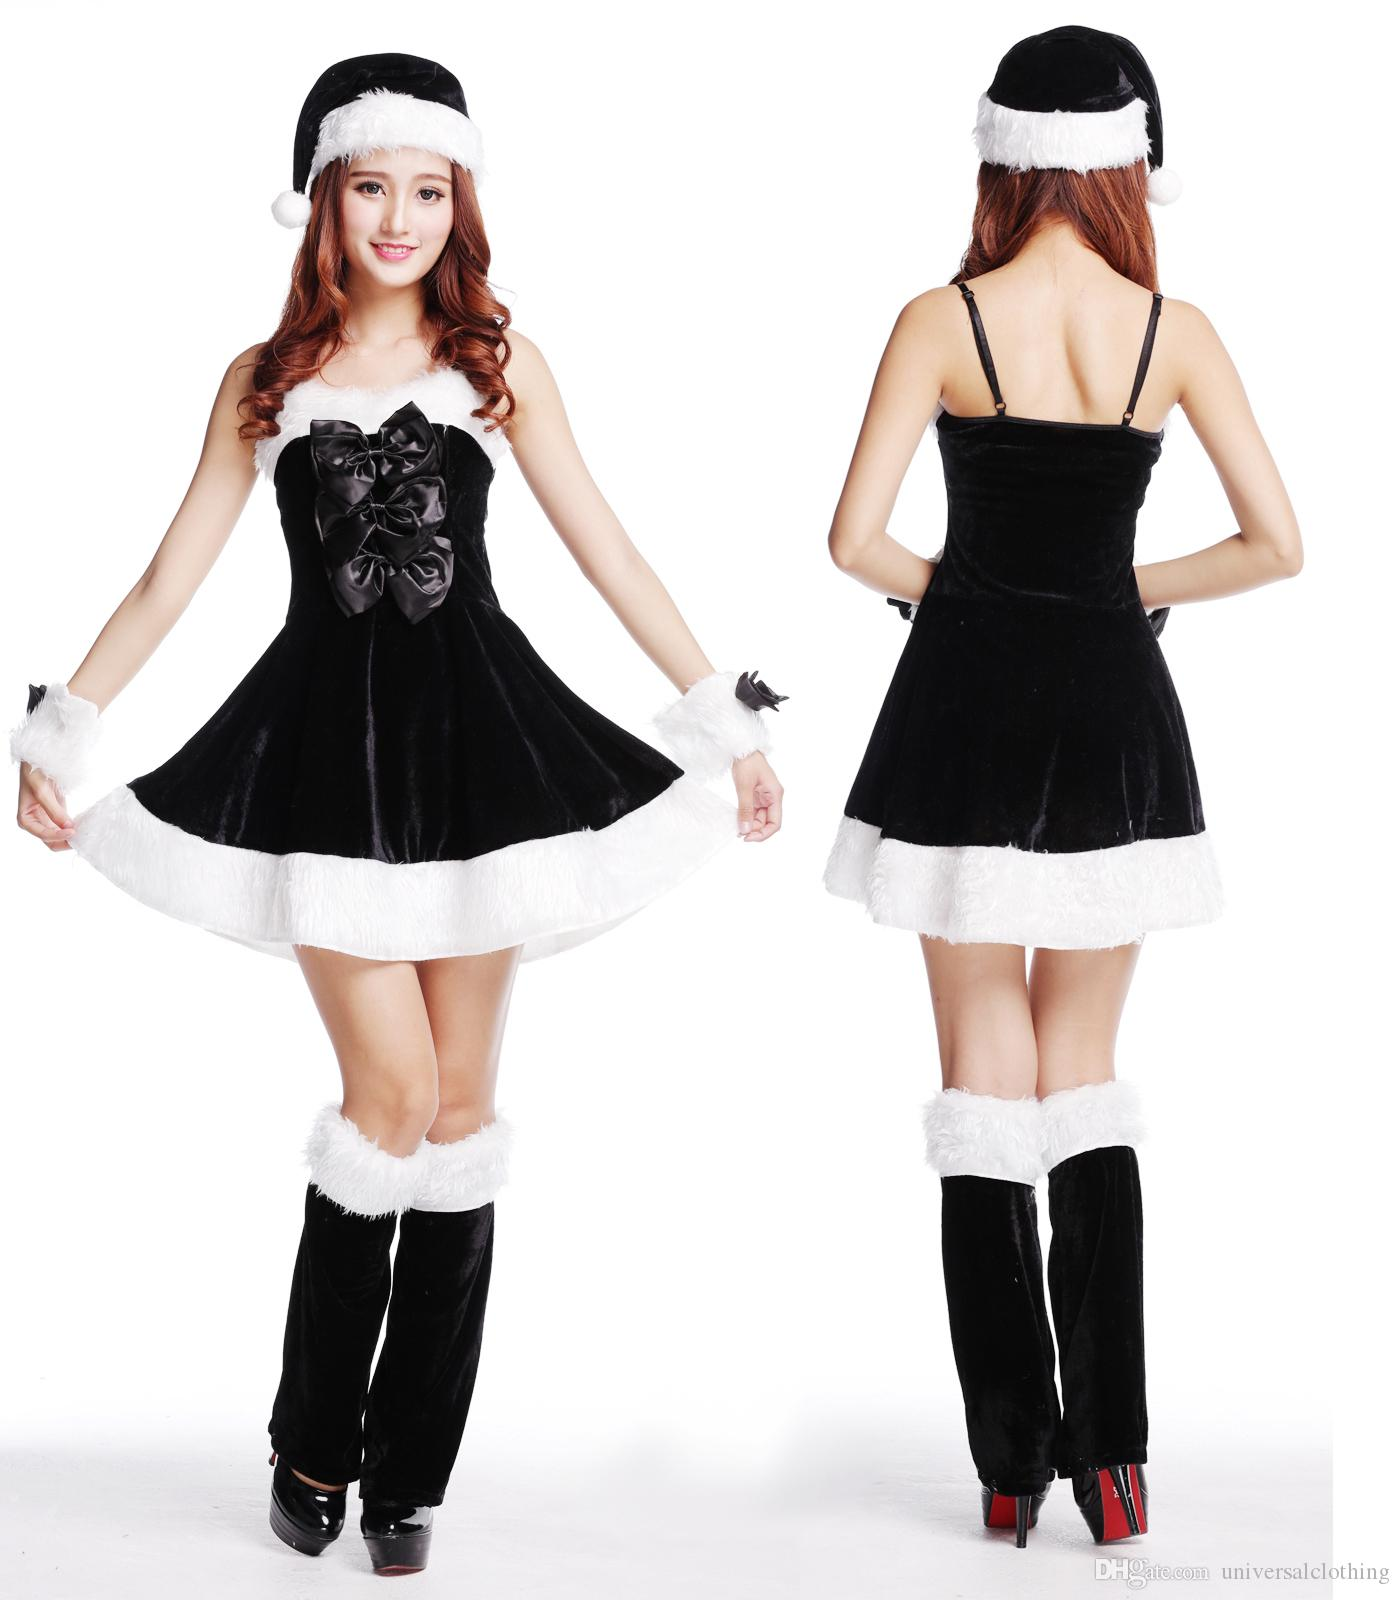 c14b49275572 Black Christmas Uniform Sexy Wrap Around The Chest Santa Role Play Party  Dress Bar